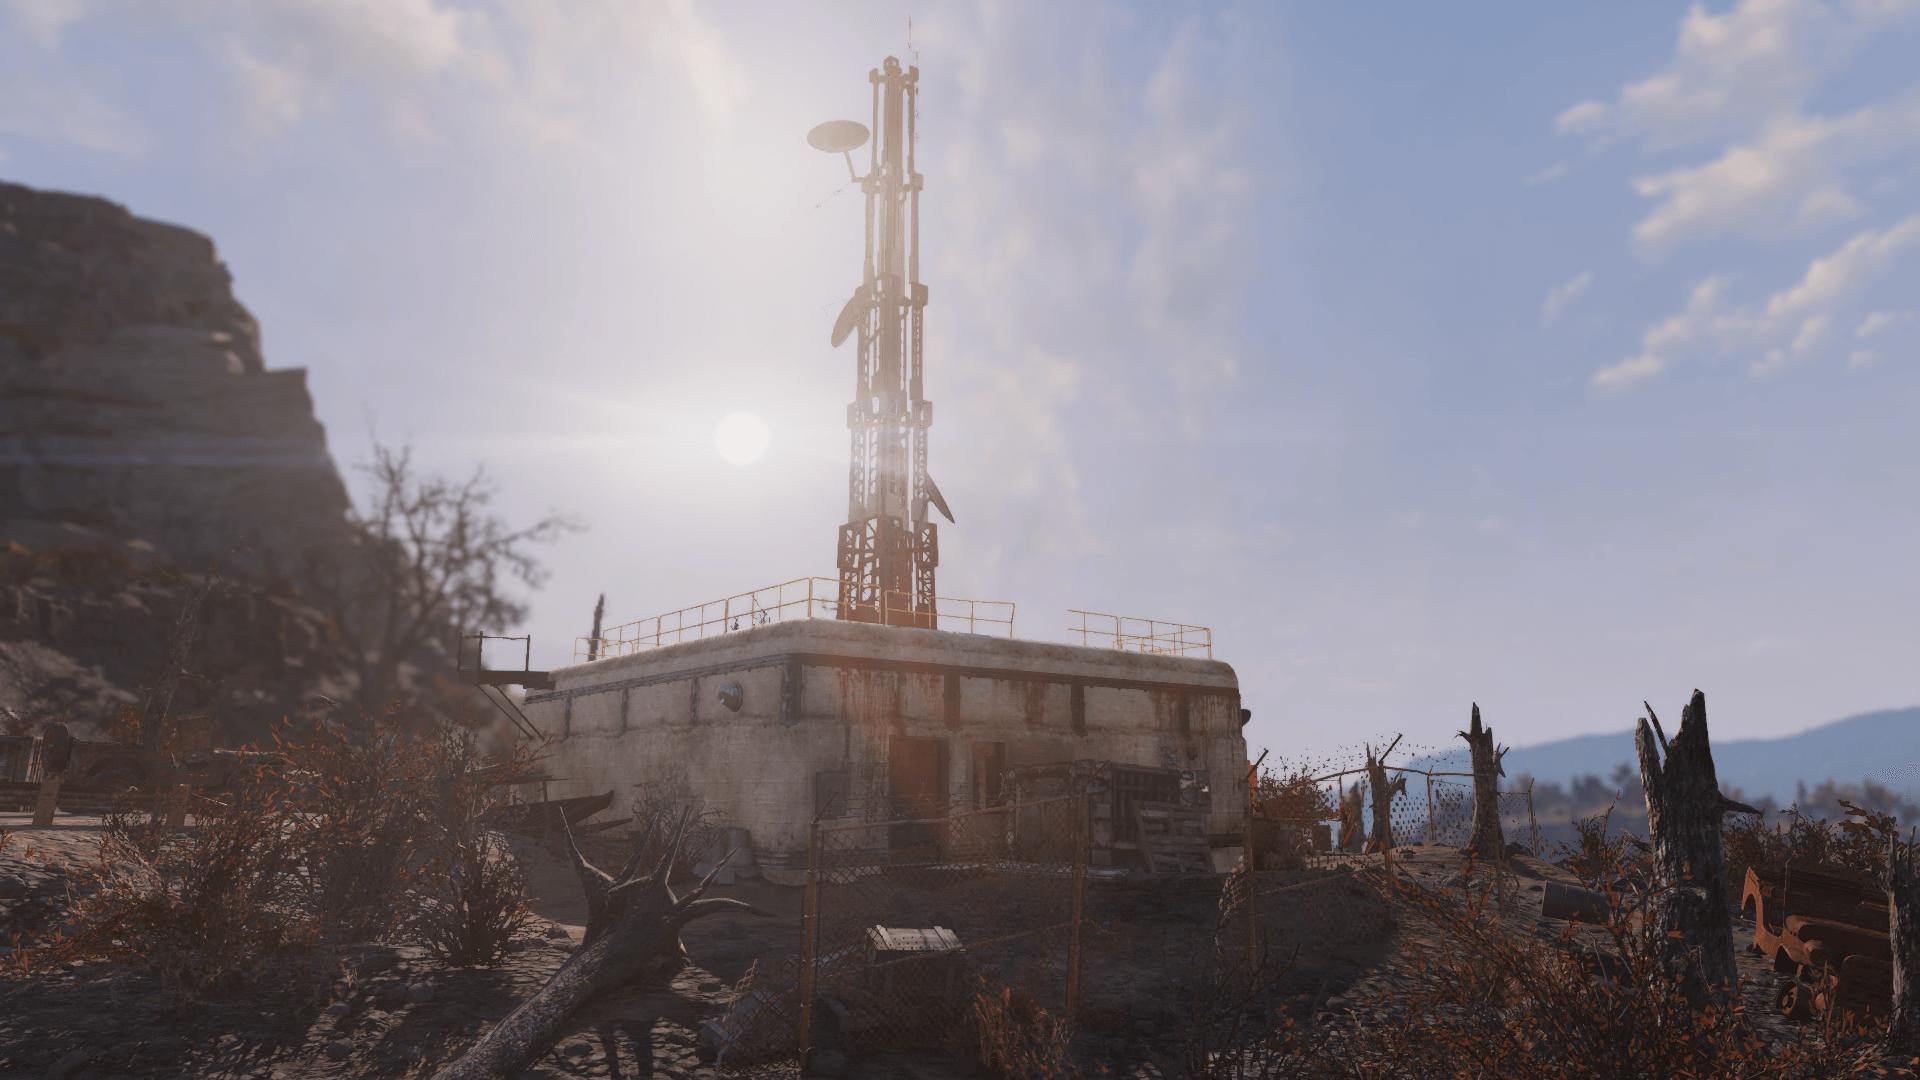 Relay tower HG-B7-09